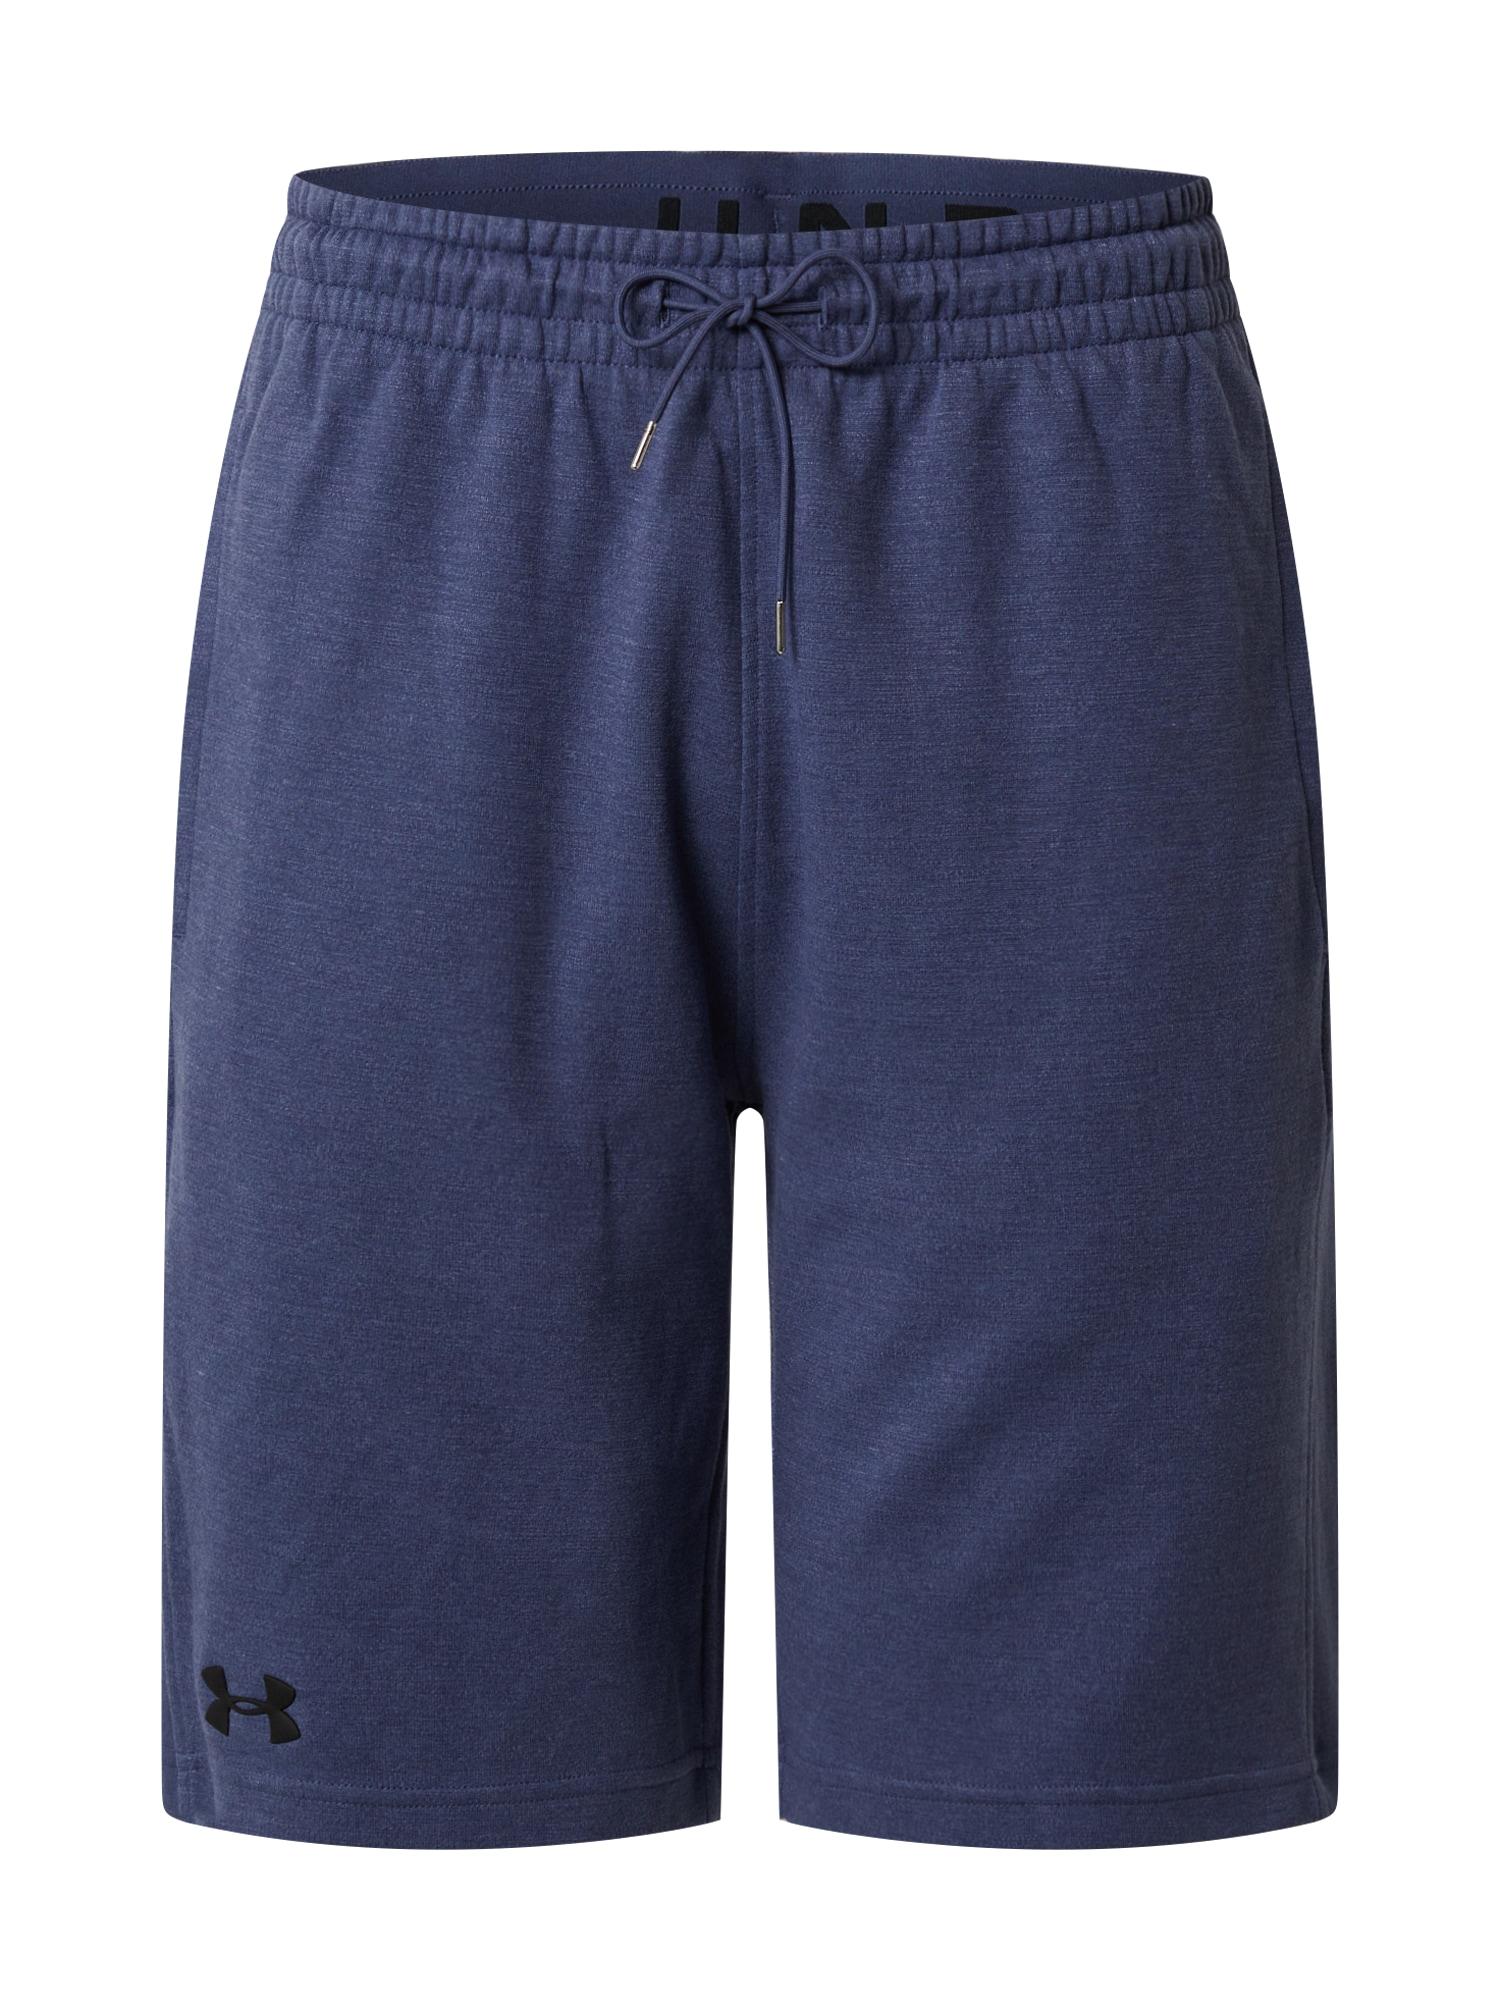 UNDER ARMOUR Sportinės kelnės 'DOUBLE KNIT SHORTS' mėlyna